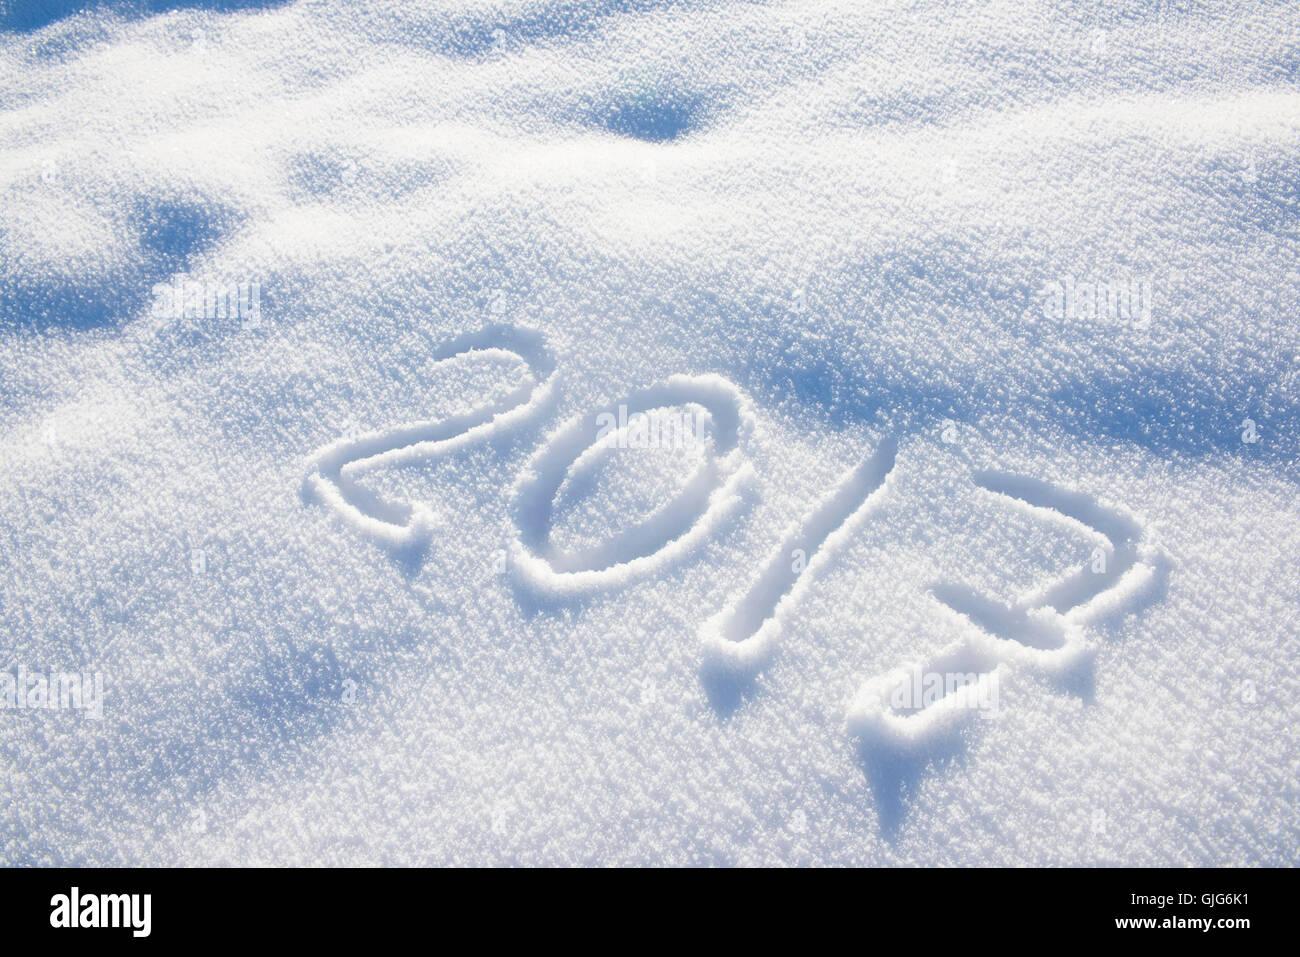 new years date 2017 written in fresh powder snow - Stock Image